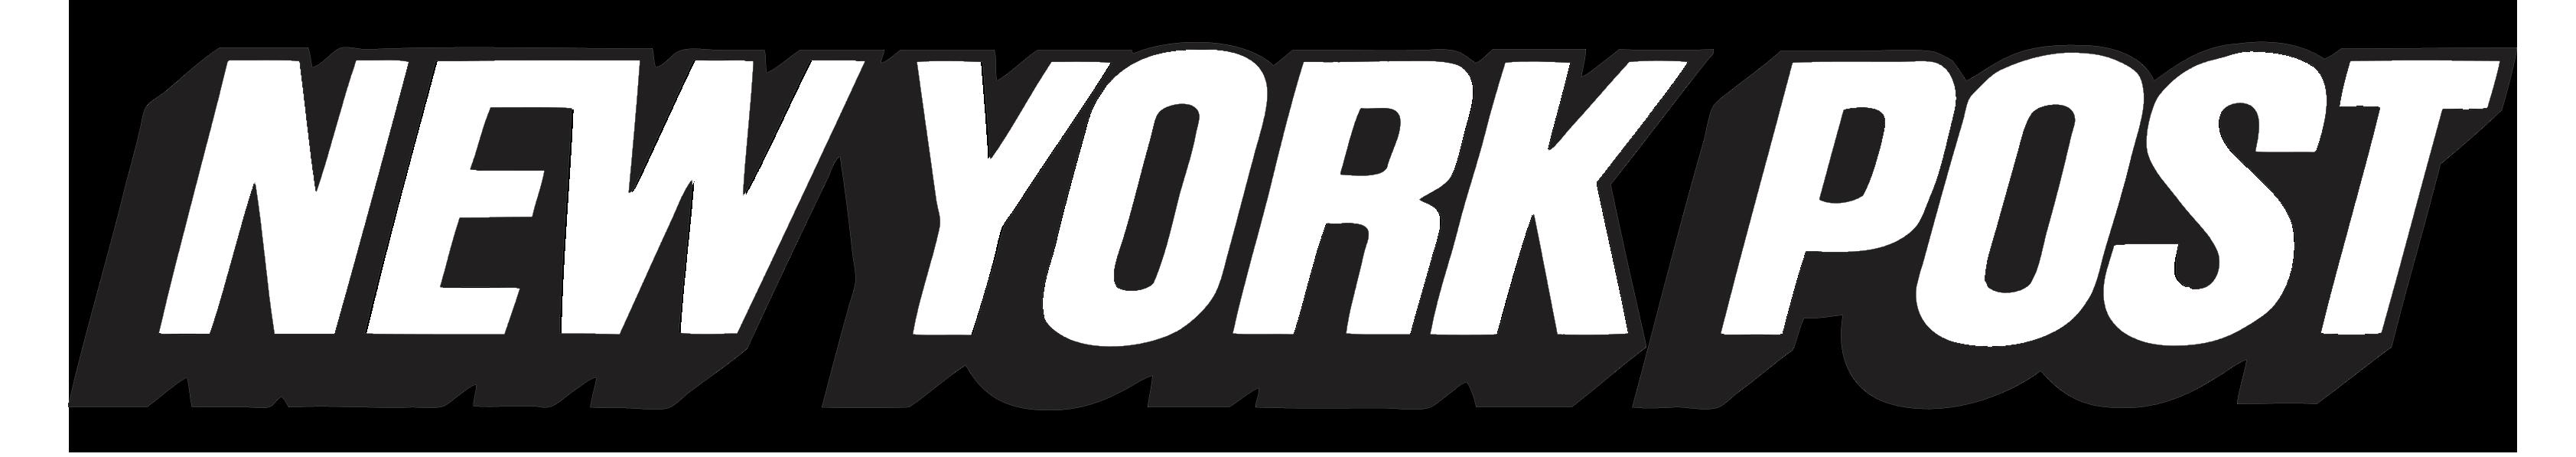 New York Post – Logos Download